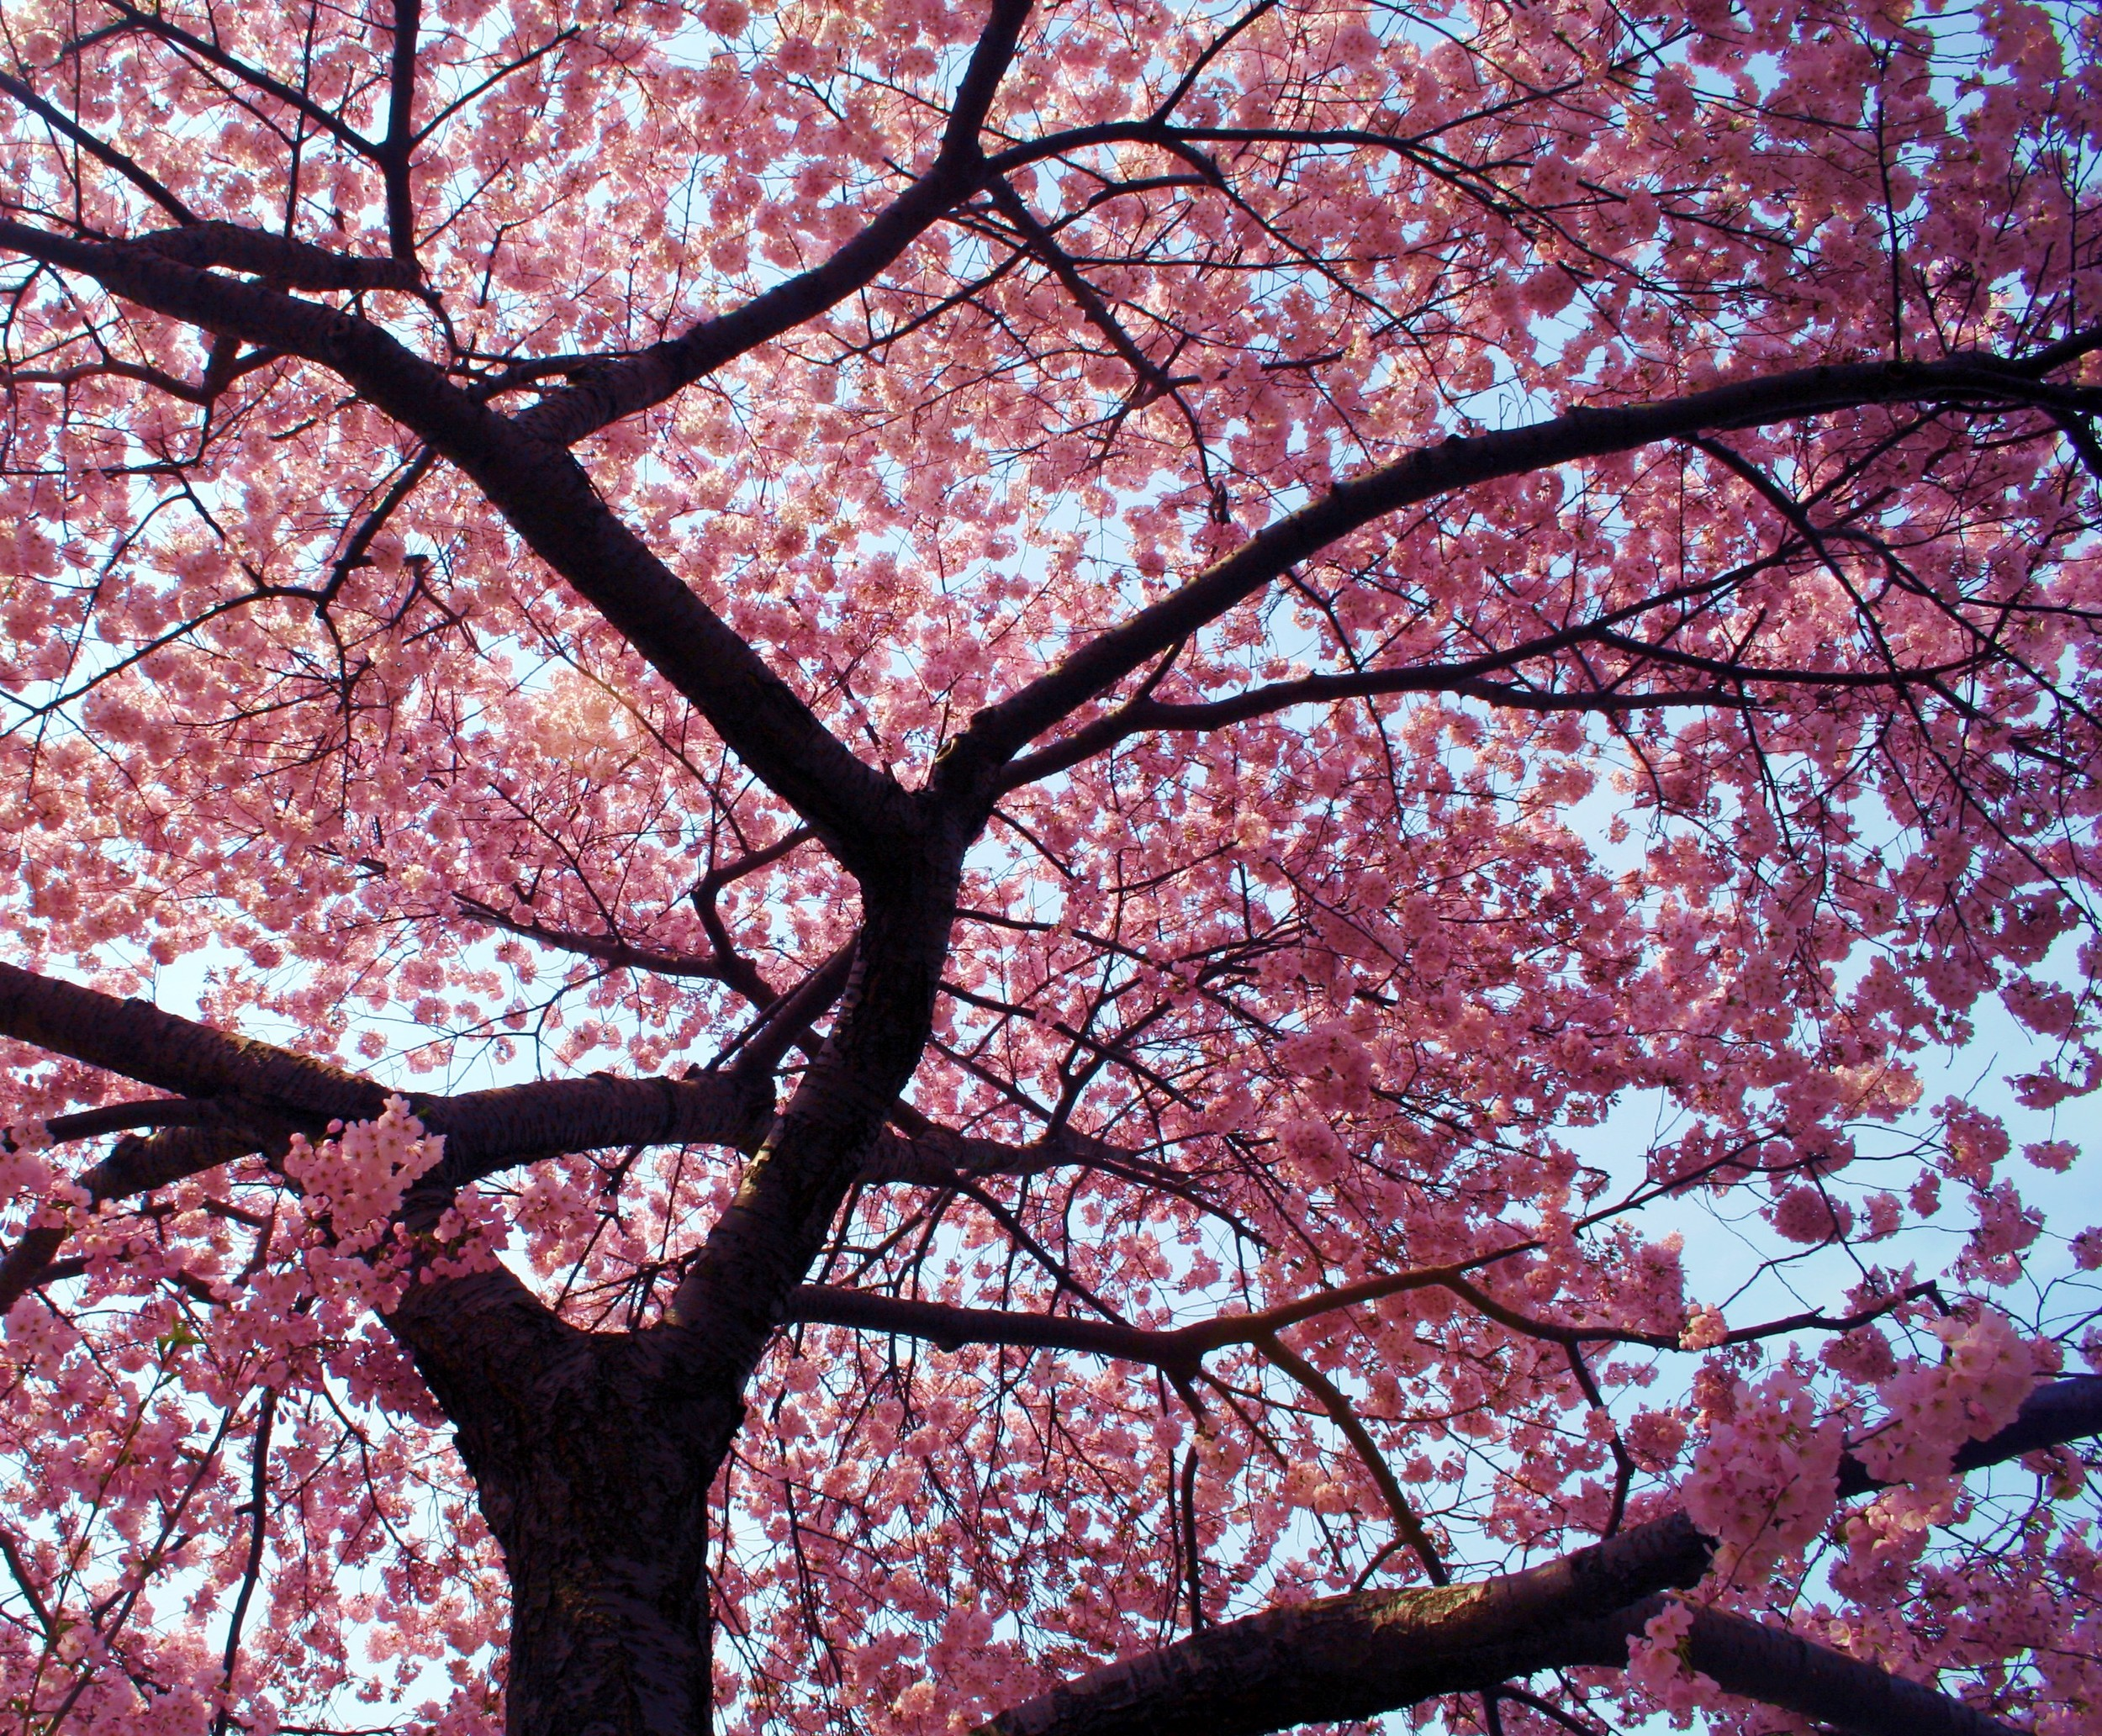 spring_cherry_blossoms_13493323951.jpg